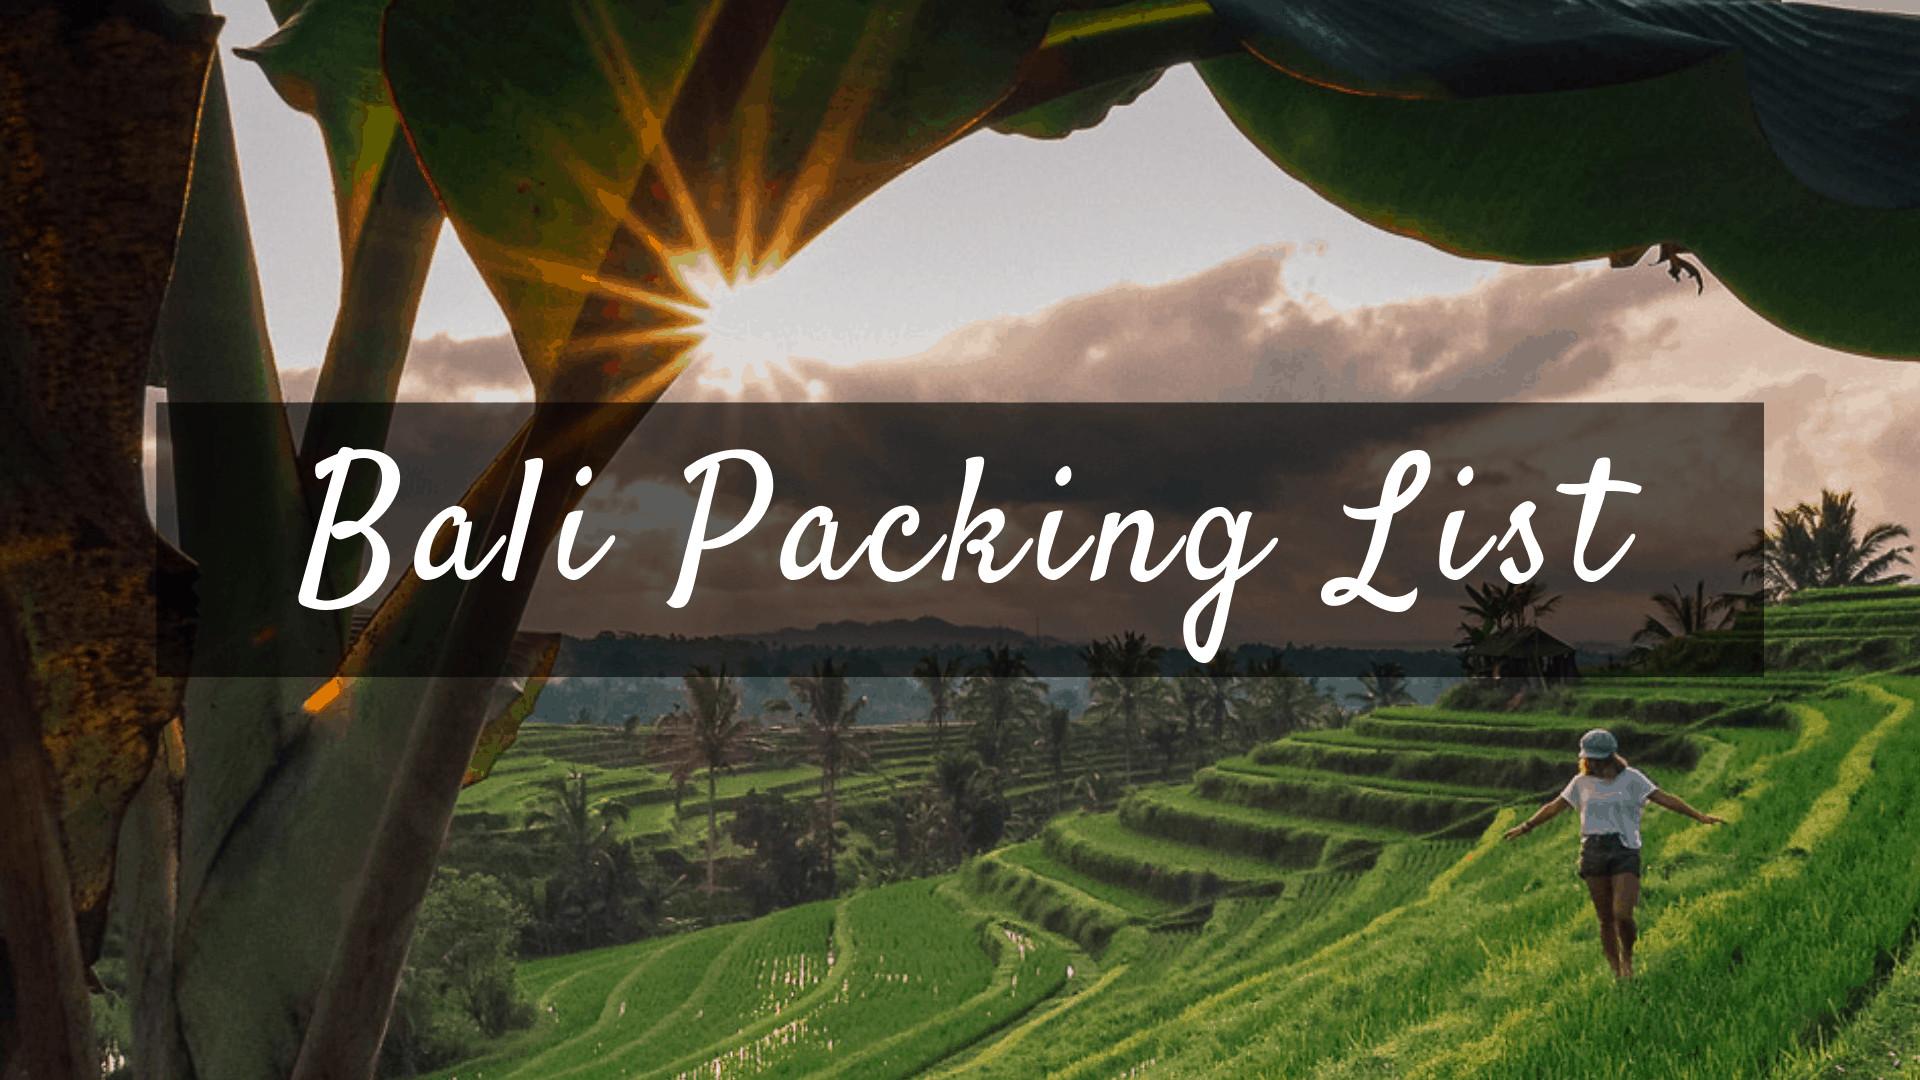 bali Packing List 1